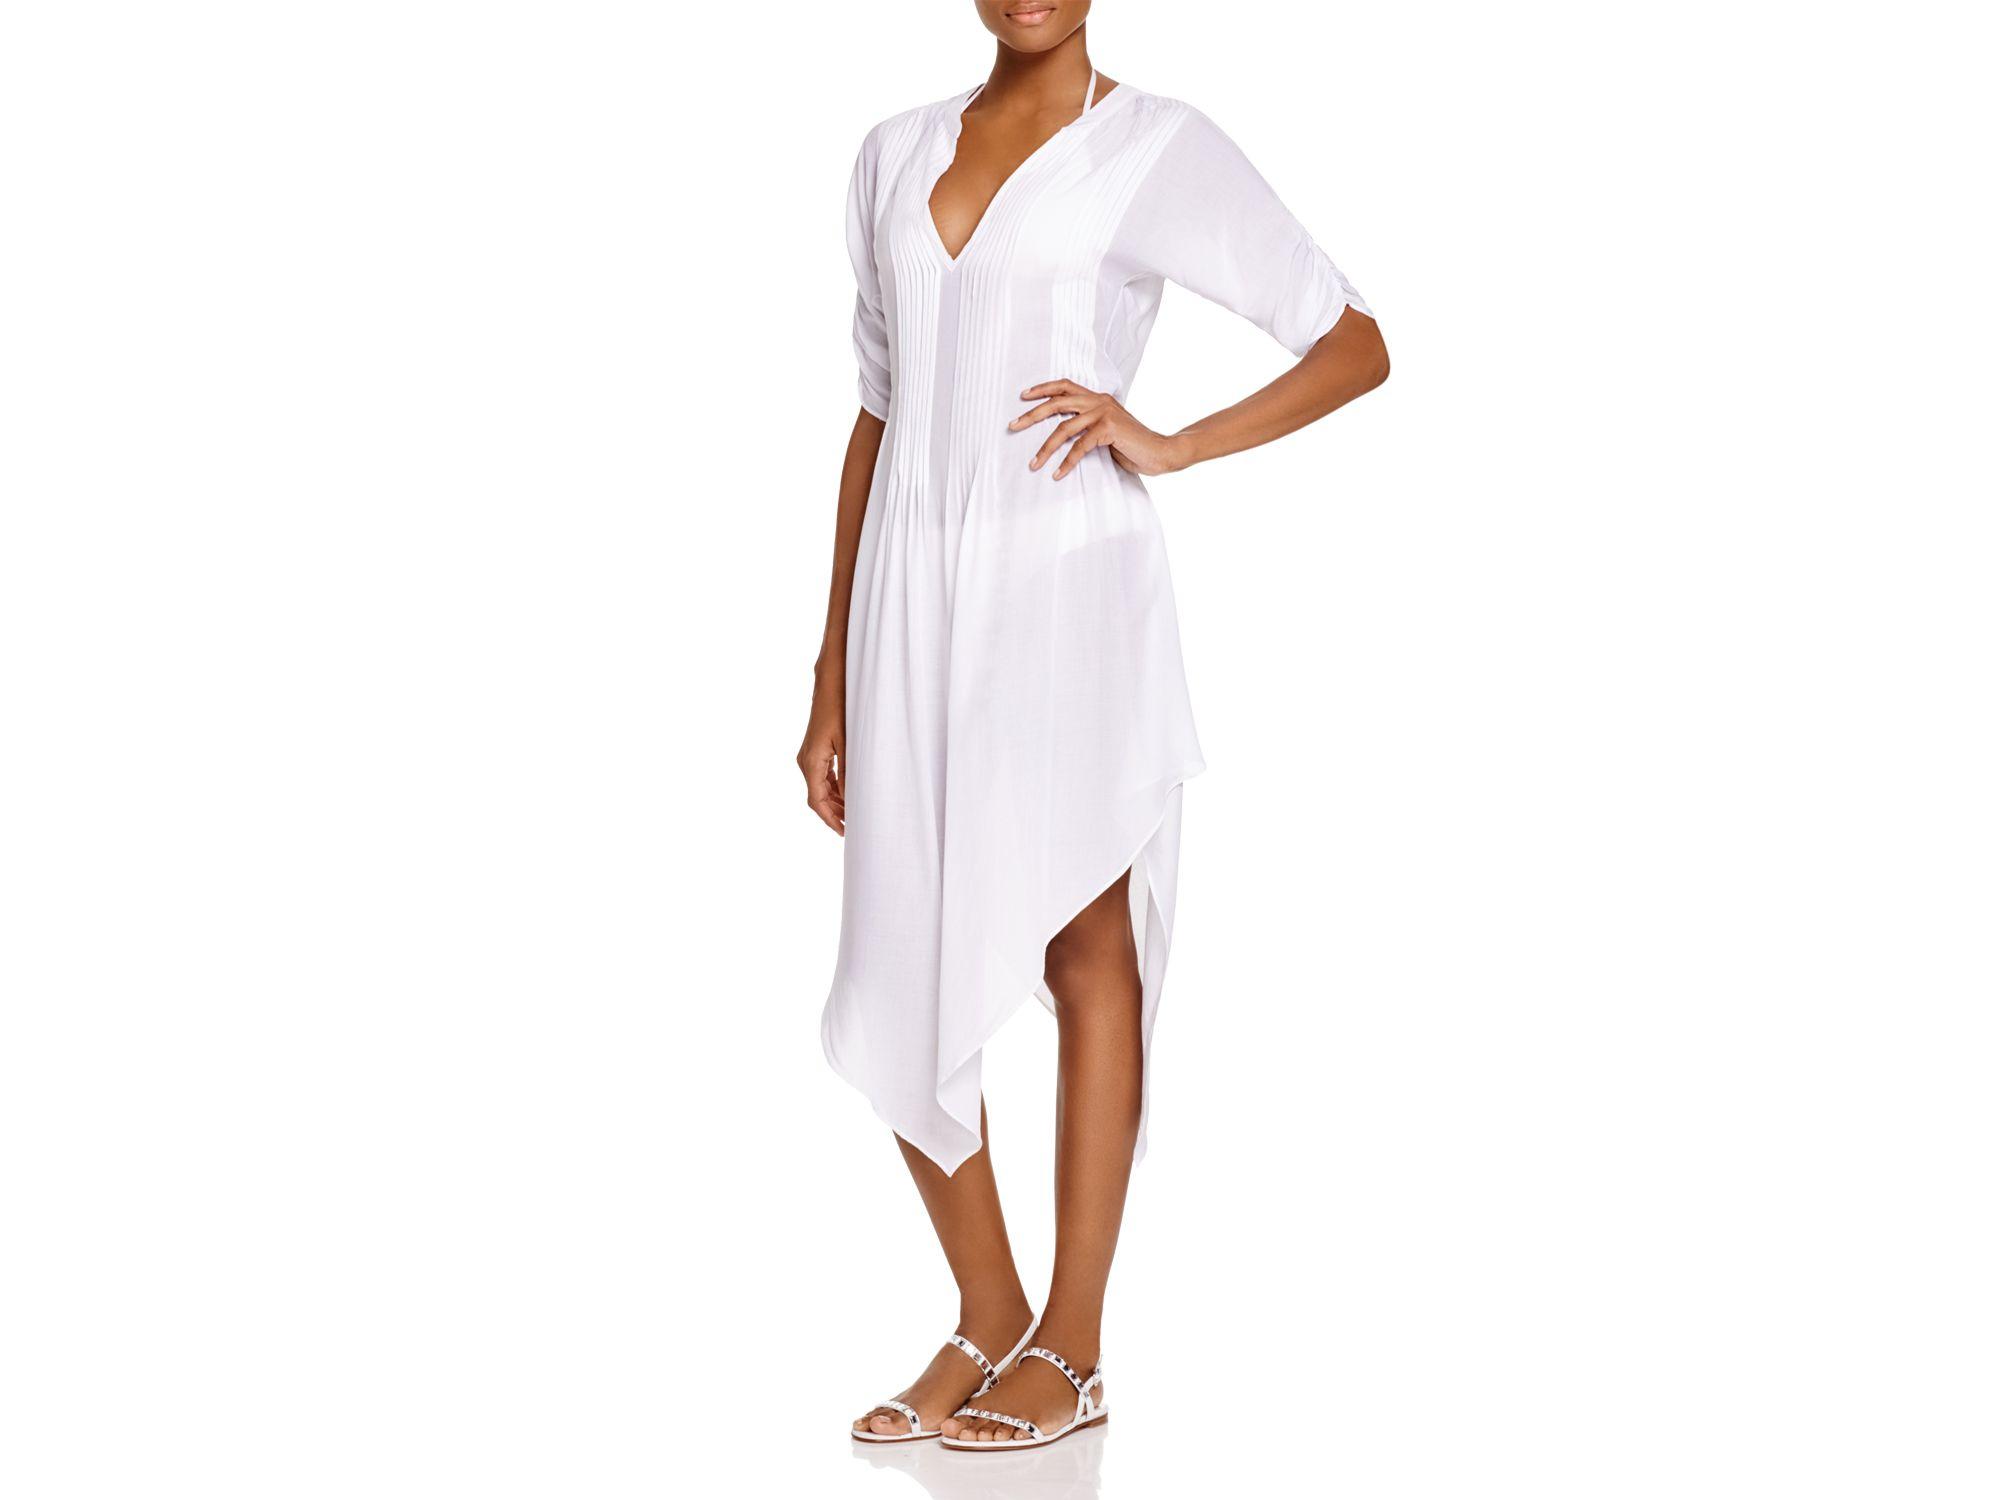 ca046c4f7e3bc Lyst - ViX Thai Tunic Swim Cover Up in White